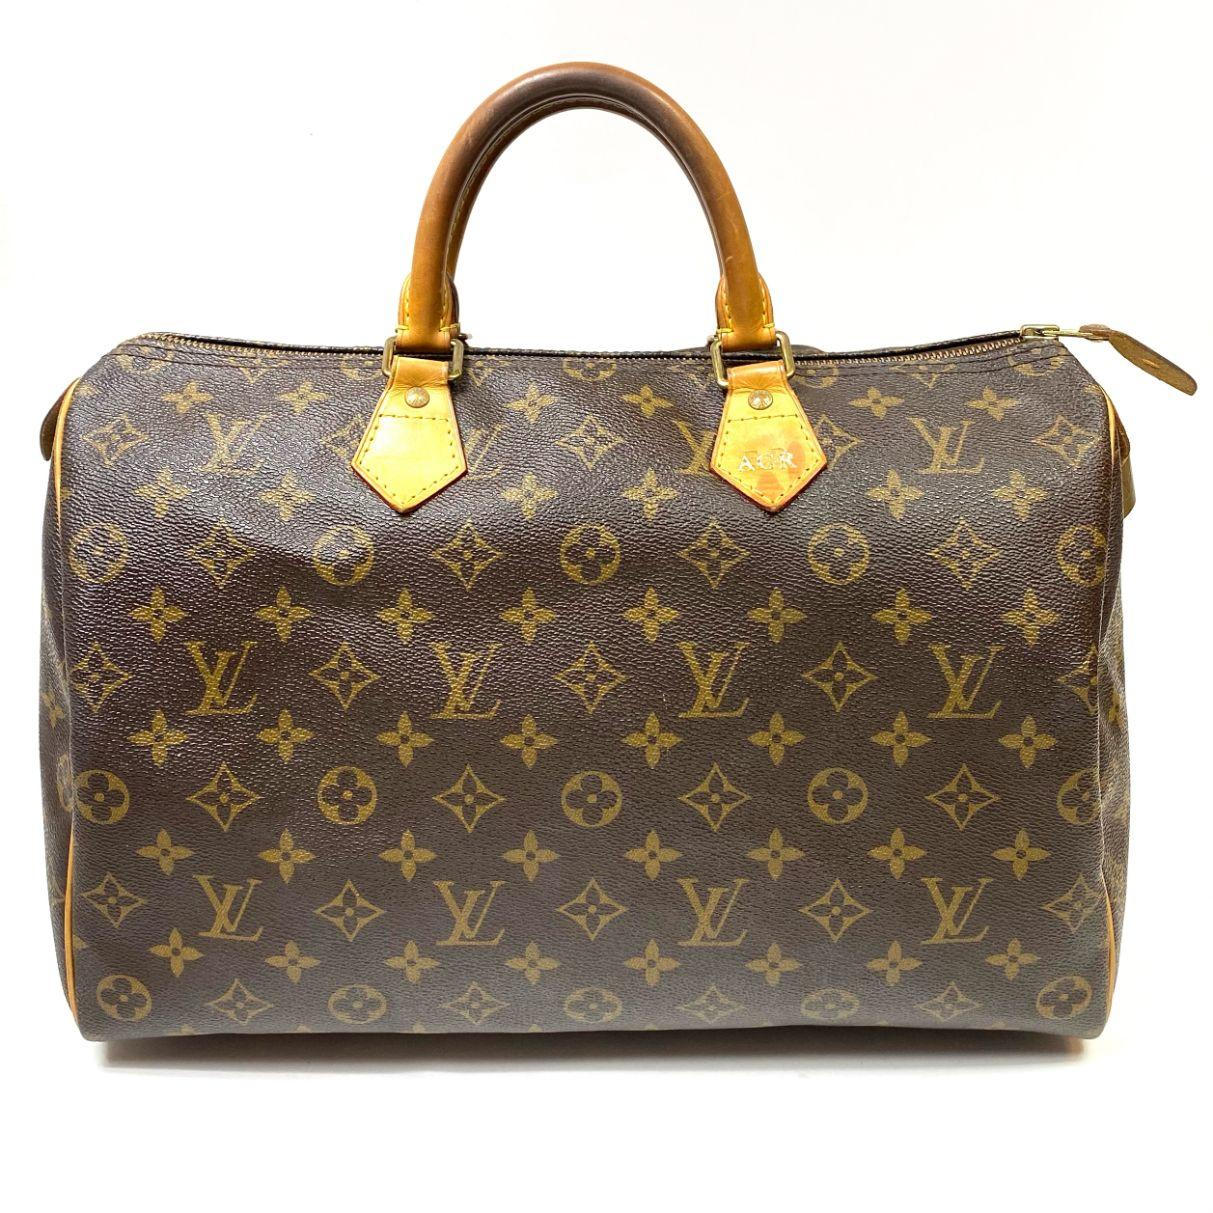 Bolsa Louis Vuitton Speedy 35 Monograma